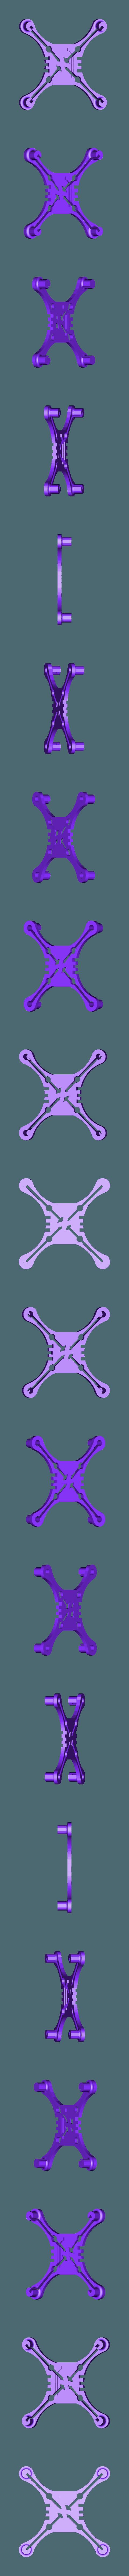 micro_quad_V1_remix_for_hubsanX4_parts.stl Download free STL file Micro quad V1 remix tor Hubsan X4 • Object to 3D print, procreator3D